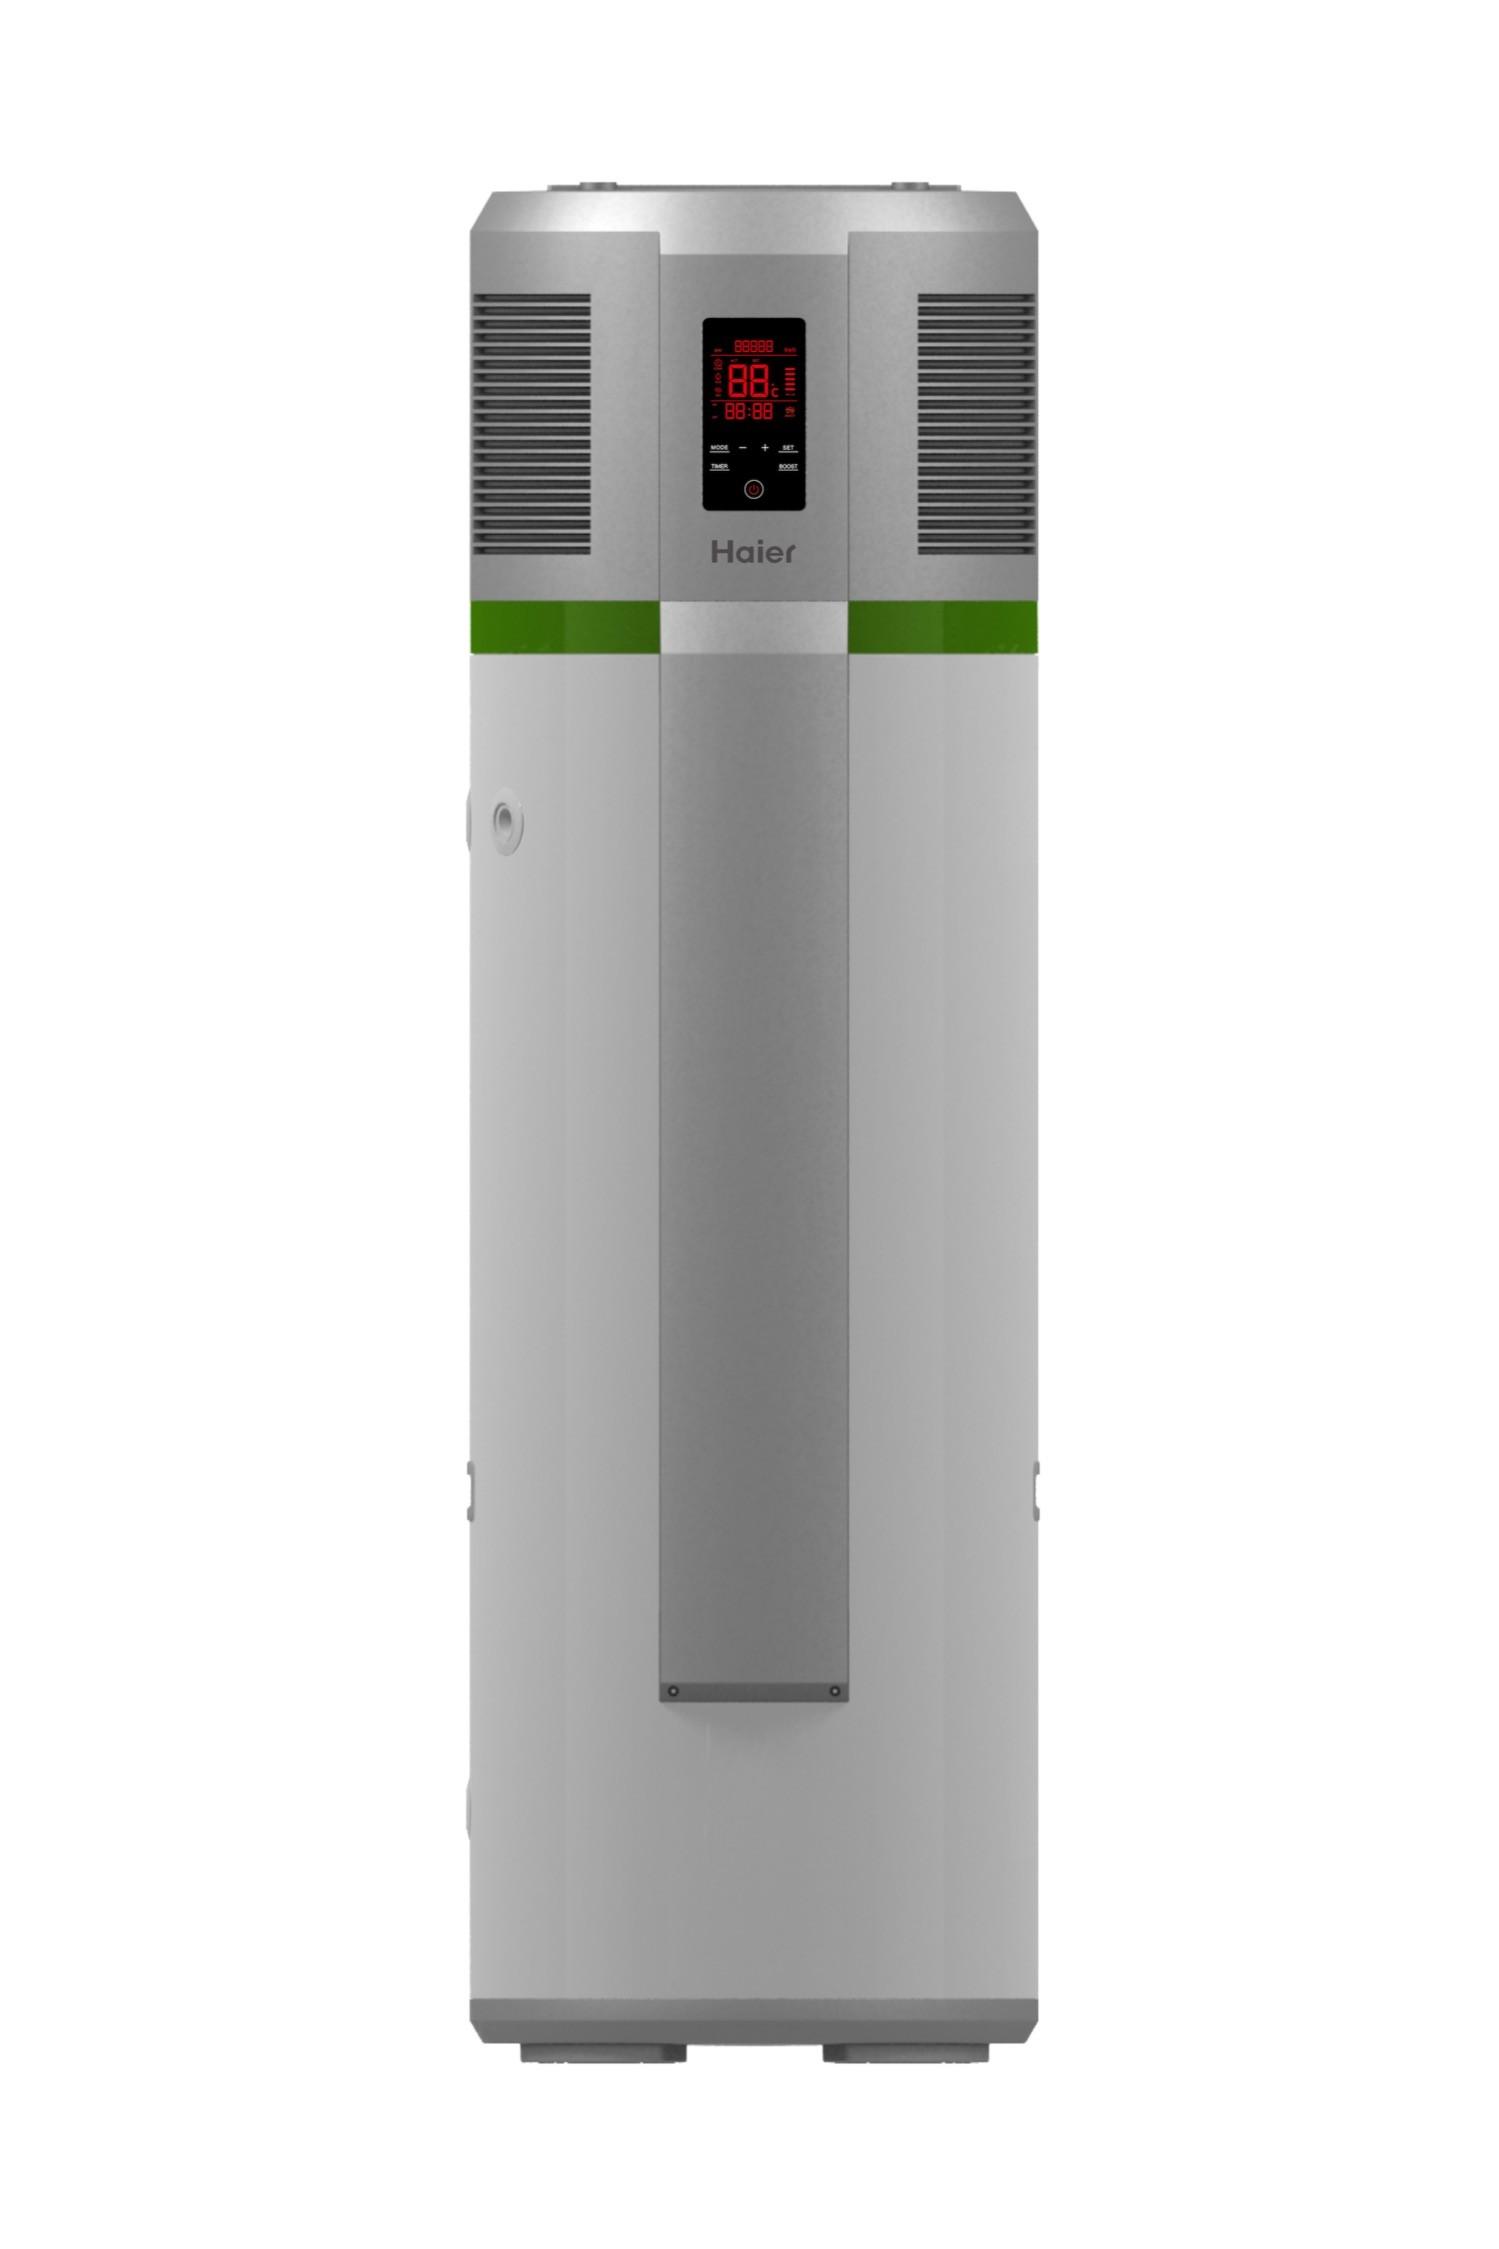 GREENoneTEC Haier Wärmepumpe HPWH M1